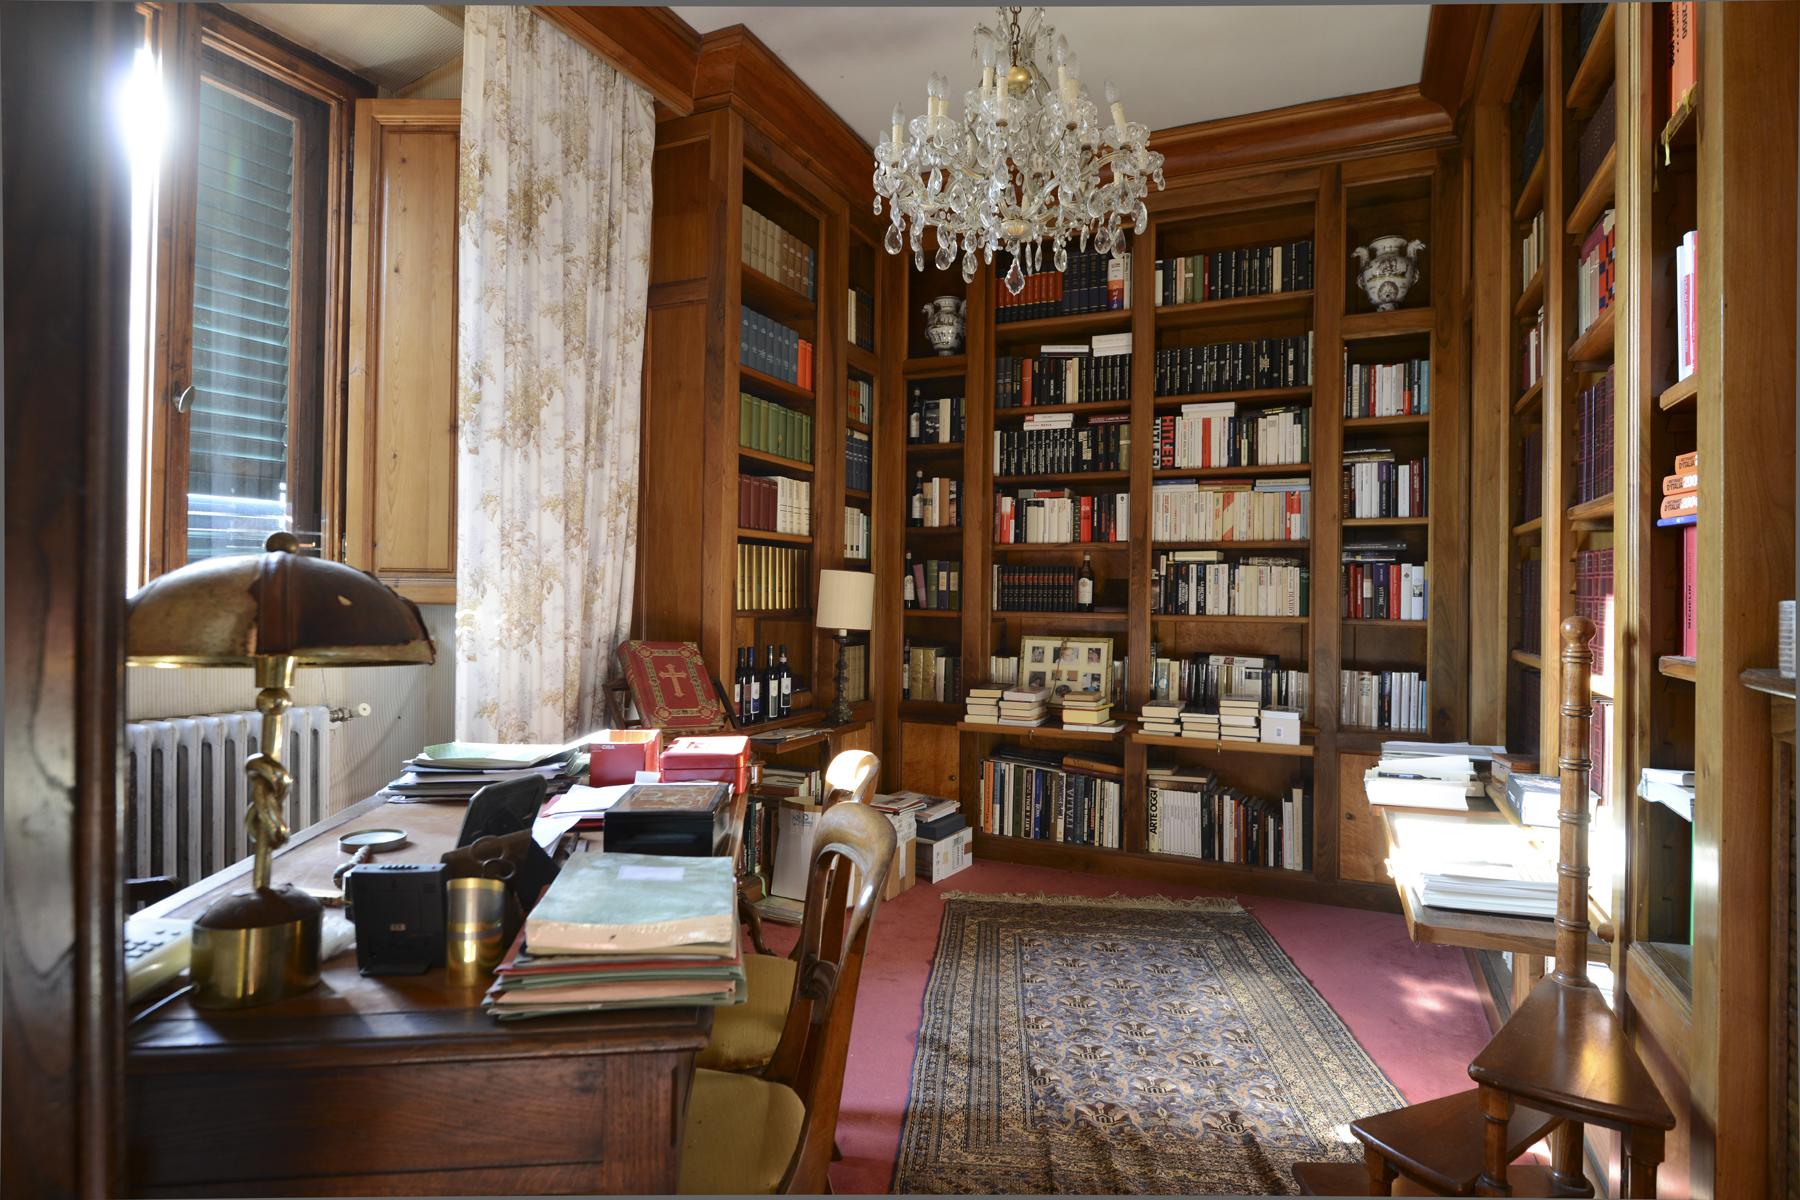 Villa in Vendita a Casciana Terme Lari: 5 locali, 1800 mq - Foto 7